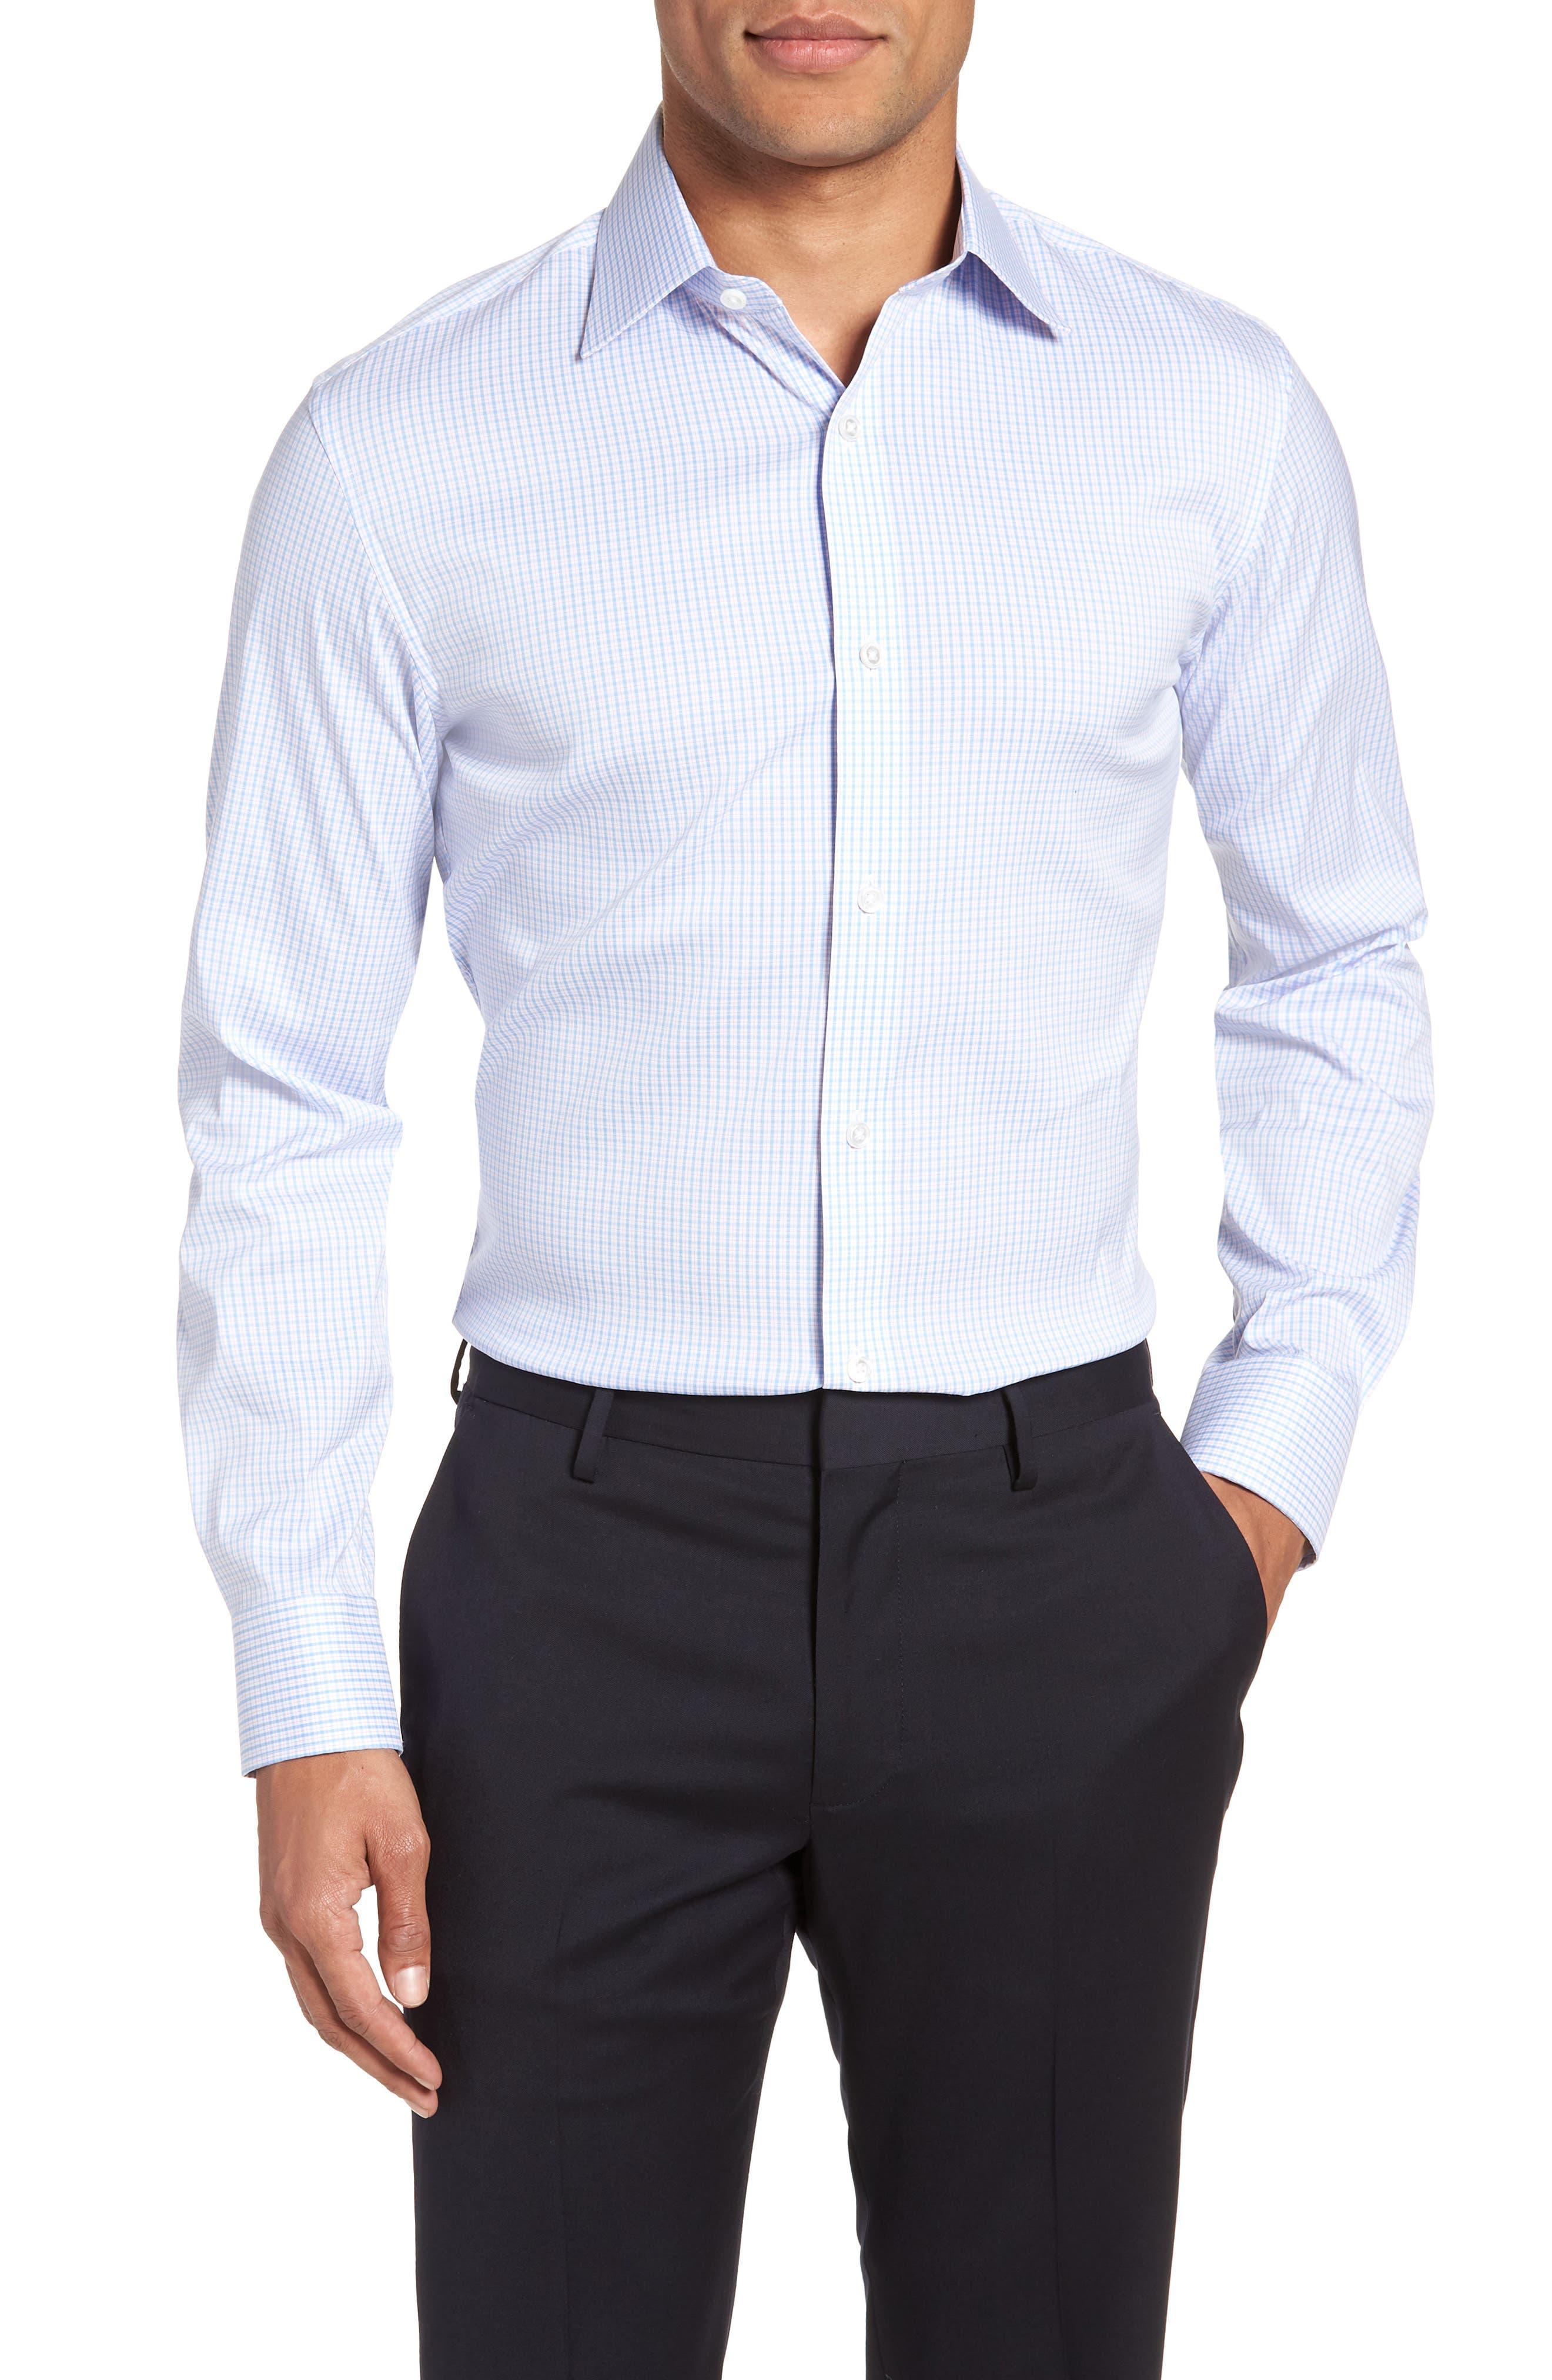 Soundview Slim Fit Stretch Check Dress Shirt,                             Main thumbnail 1, color,                             400